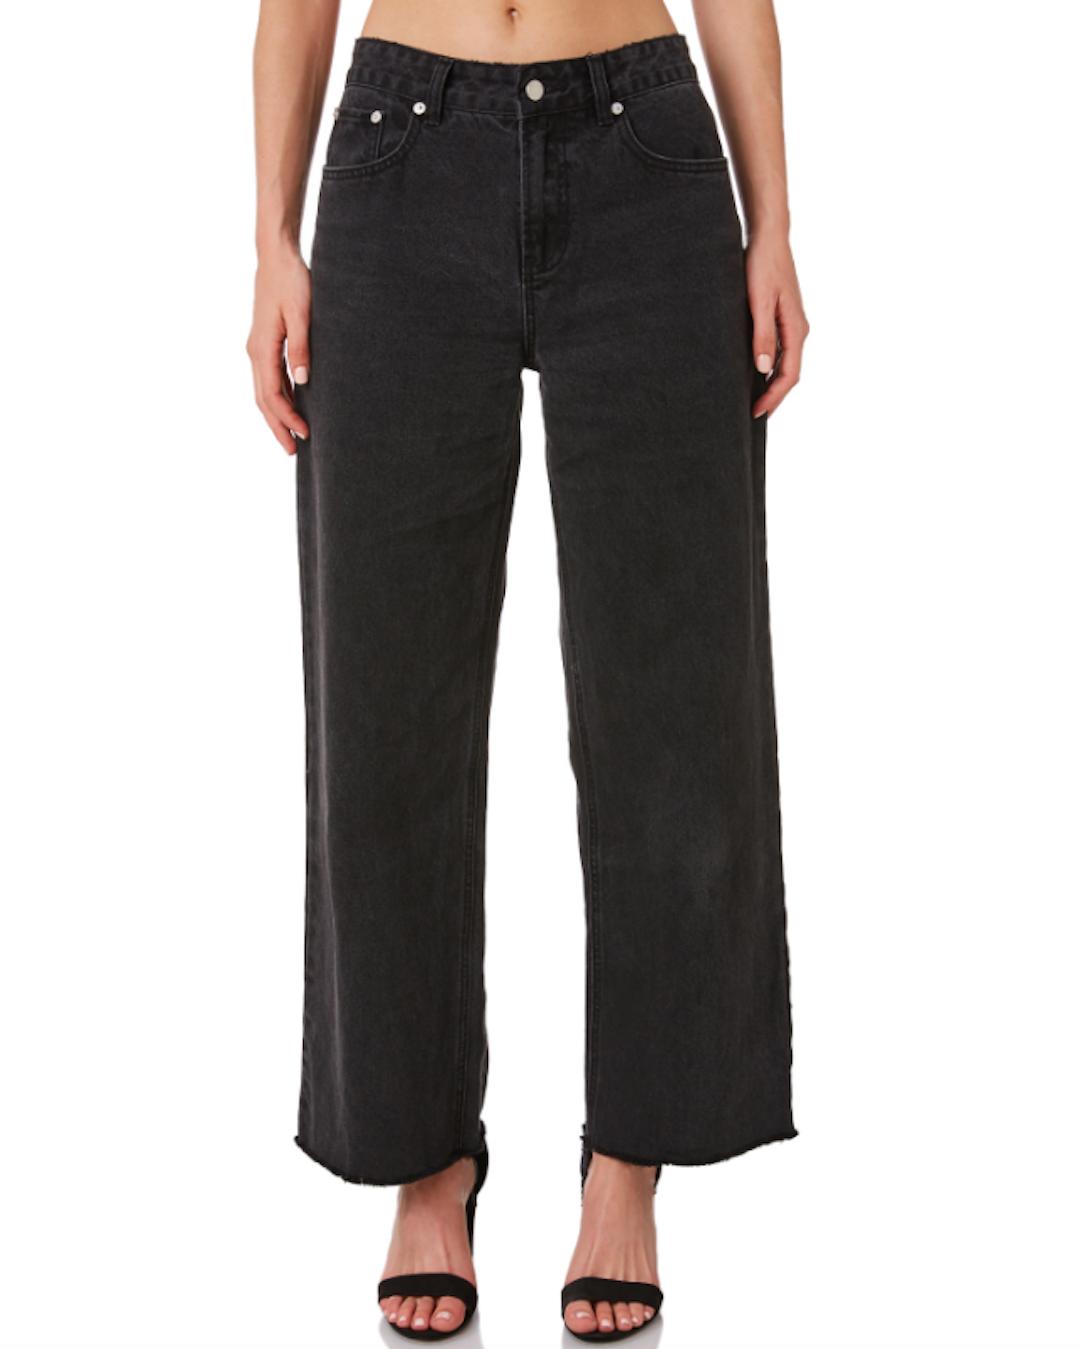 A woman wears black baggy high-waisted jeans.